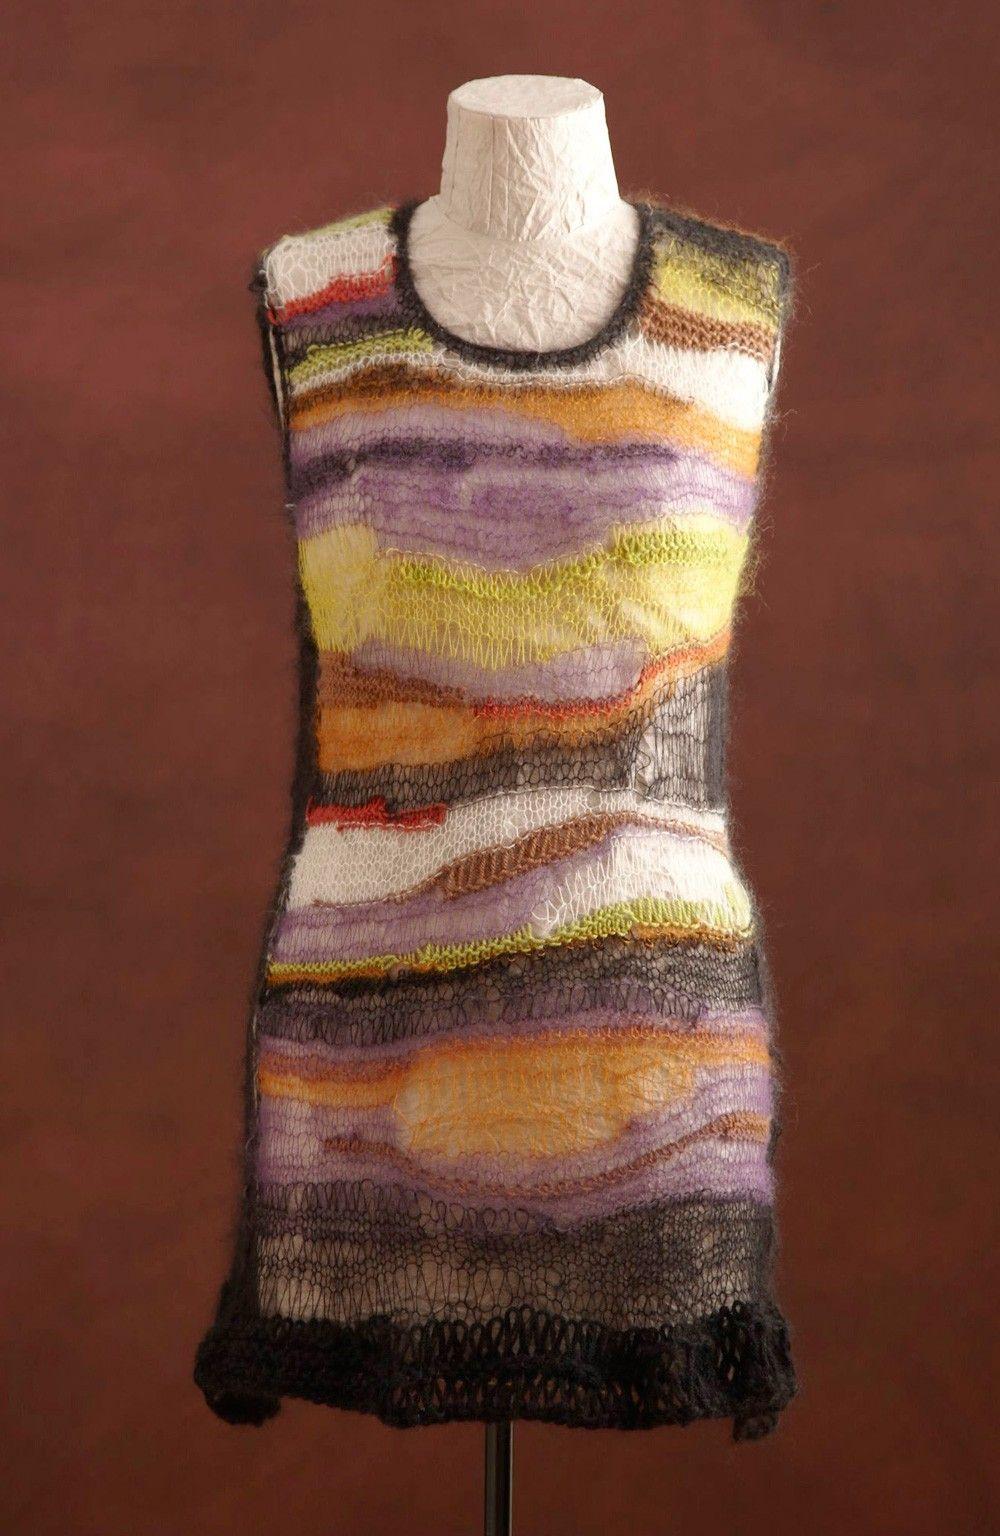 Avant-Garde Tunic (Knit) | knitted clothing | Pinterest | Avant ...